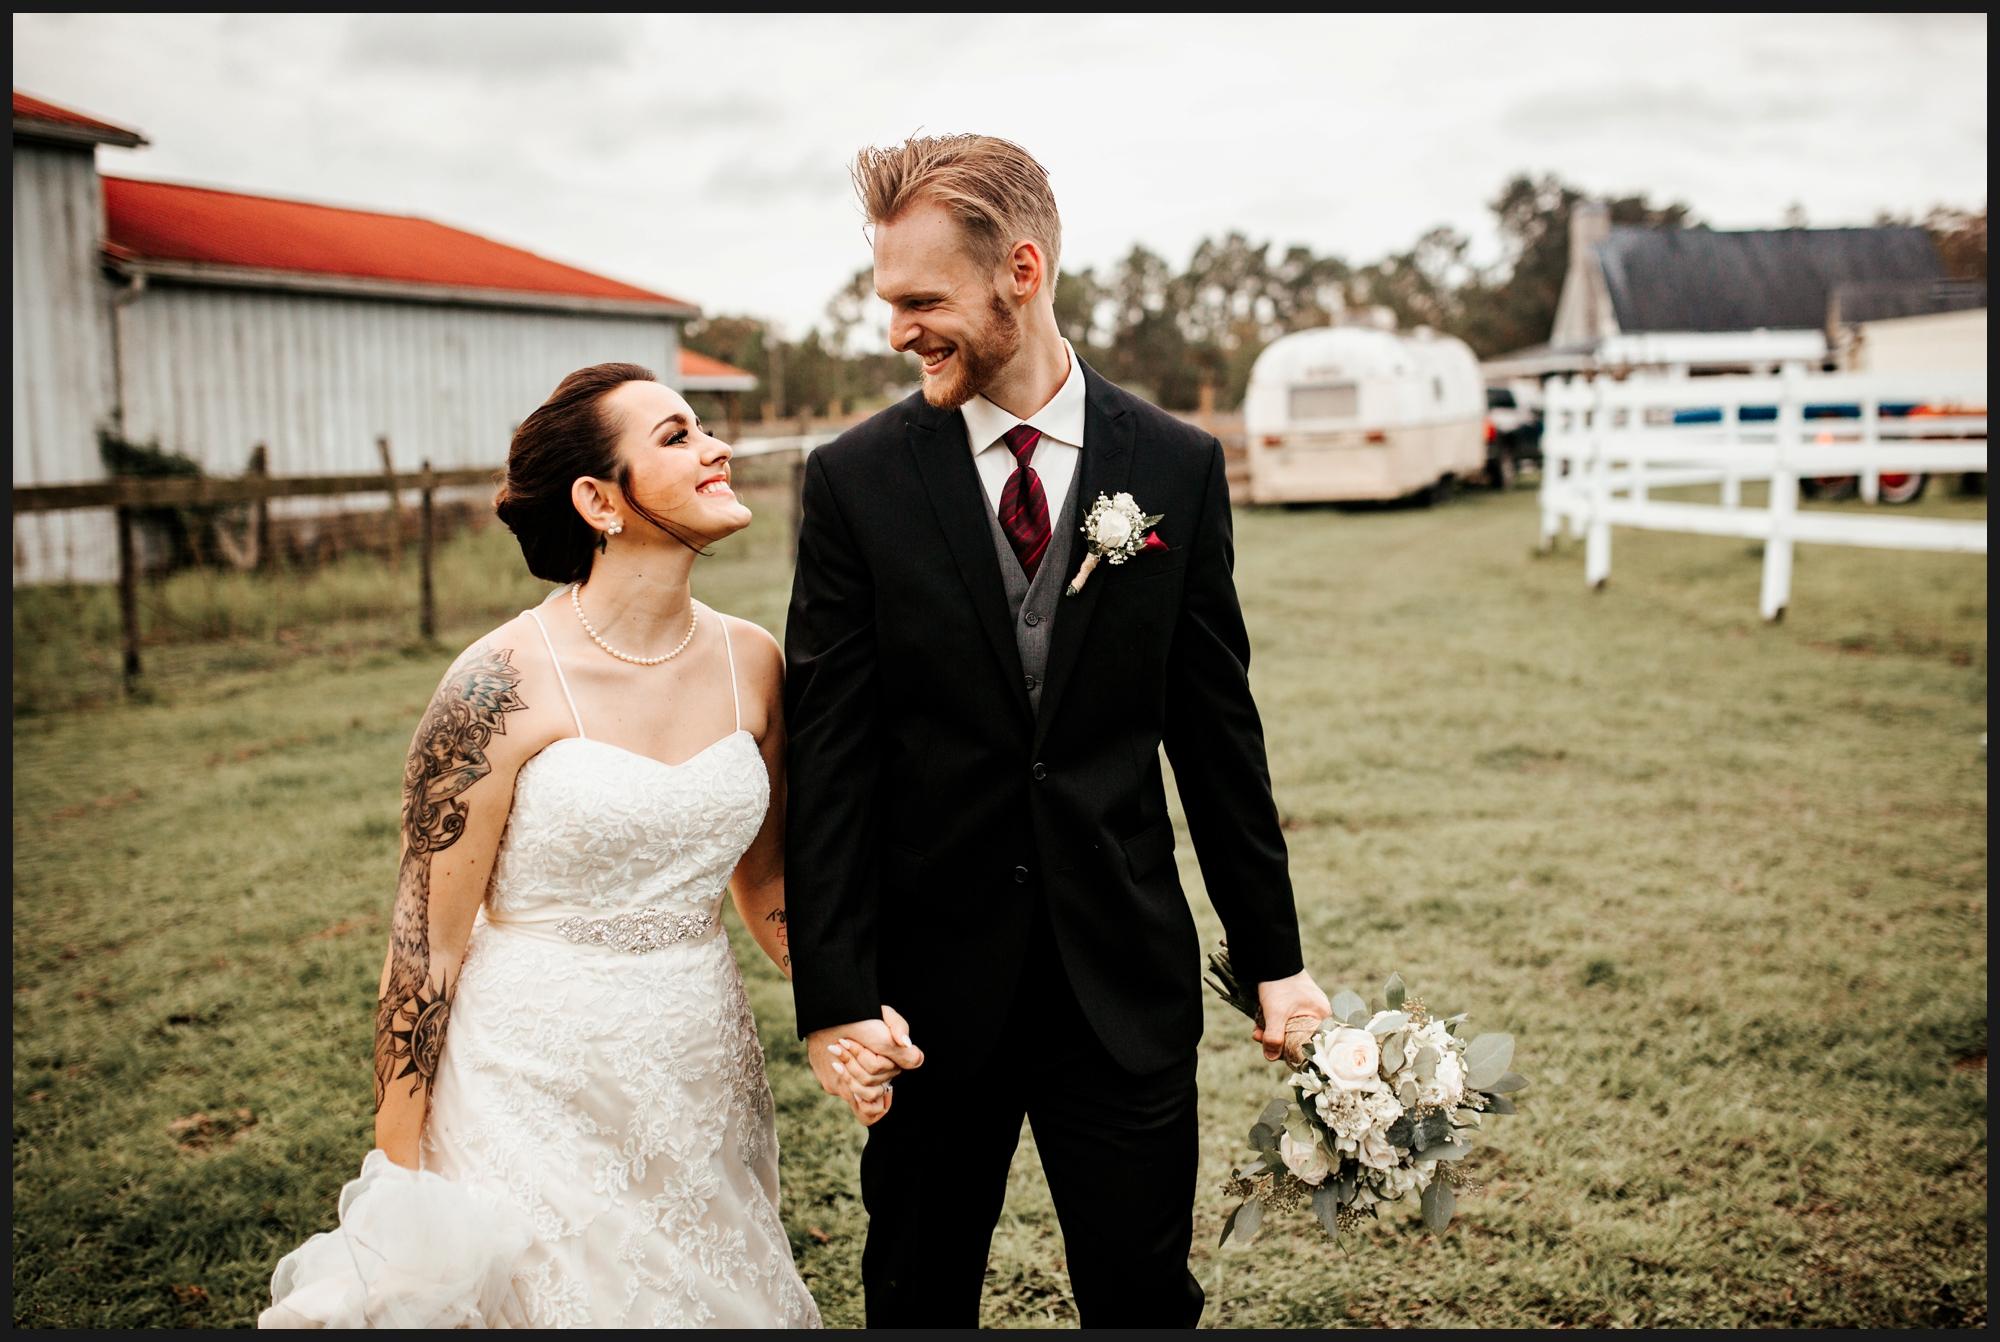 Orlando-Wedding-Photographer-destination-wedding-photographer-florida-wedding-photographer-bohemian-wedding-photographer_0366.jpg